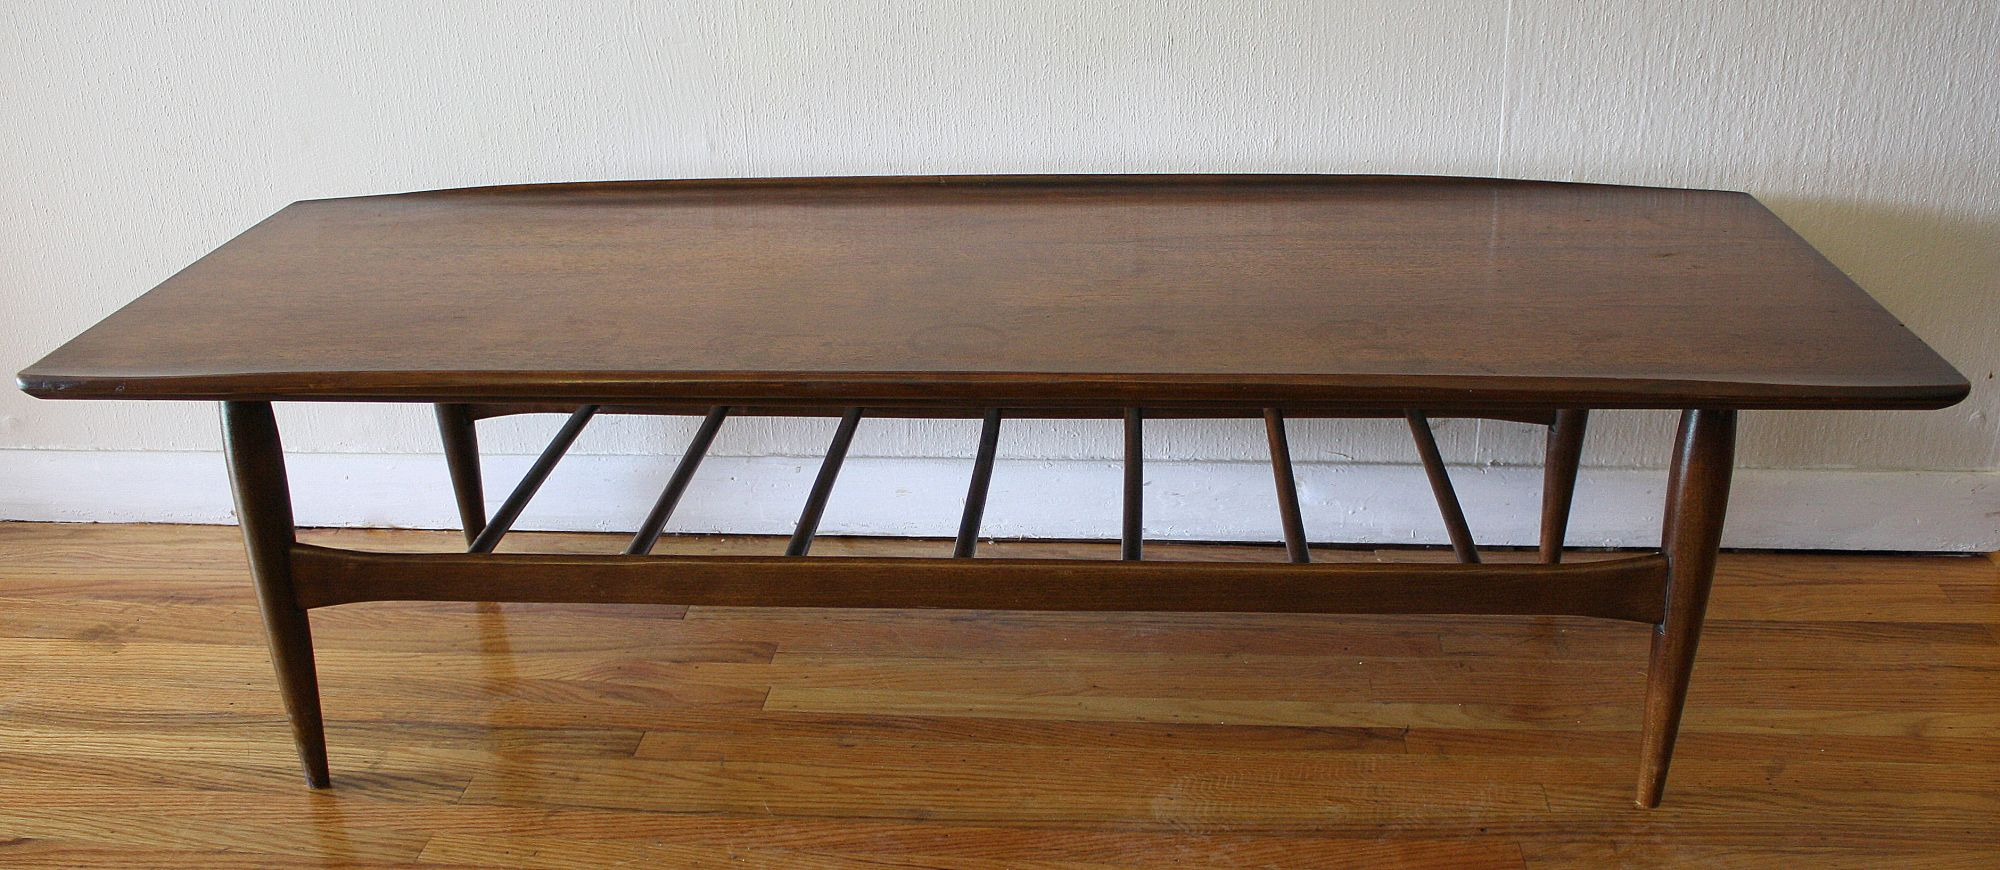 Mid Century Modern Bassett Coffee Table With Surfboard Edges Picked Vintage Coffee Table Surfboard Coffee Table Table [ 870 x 2000 Pixel ]